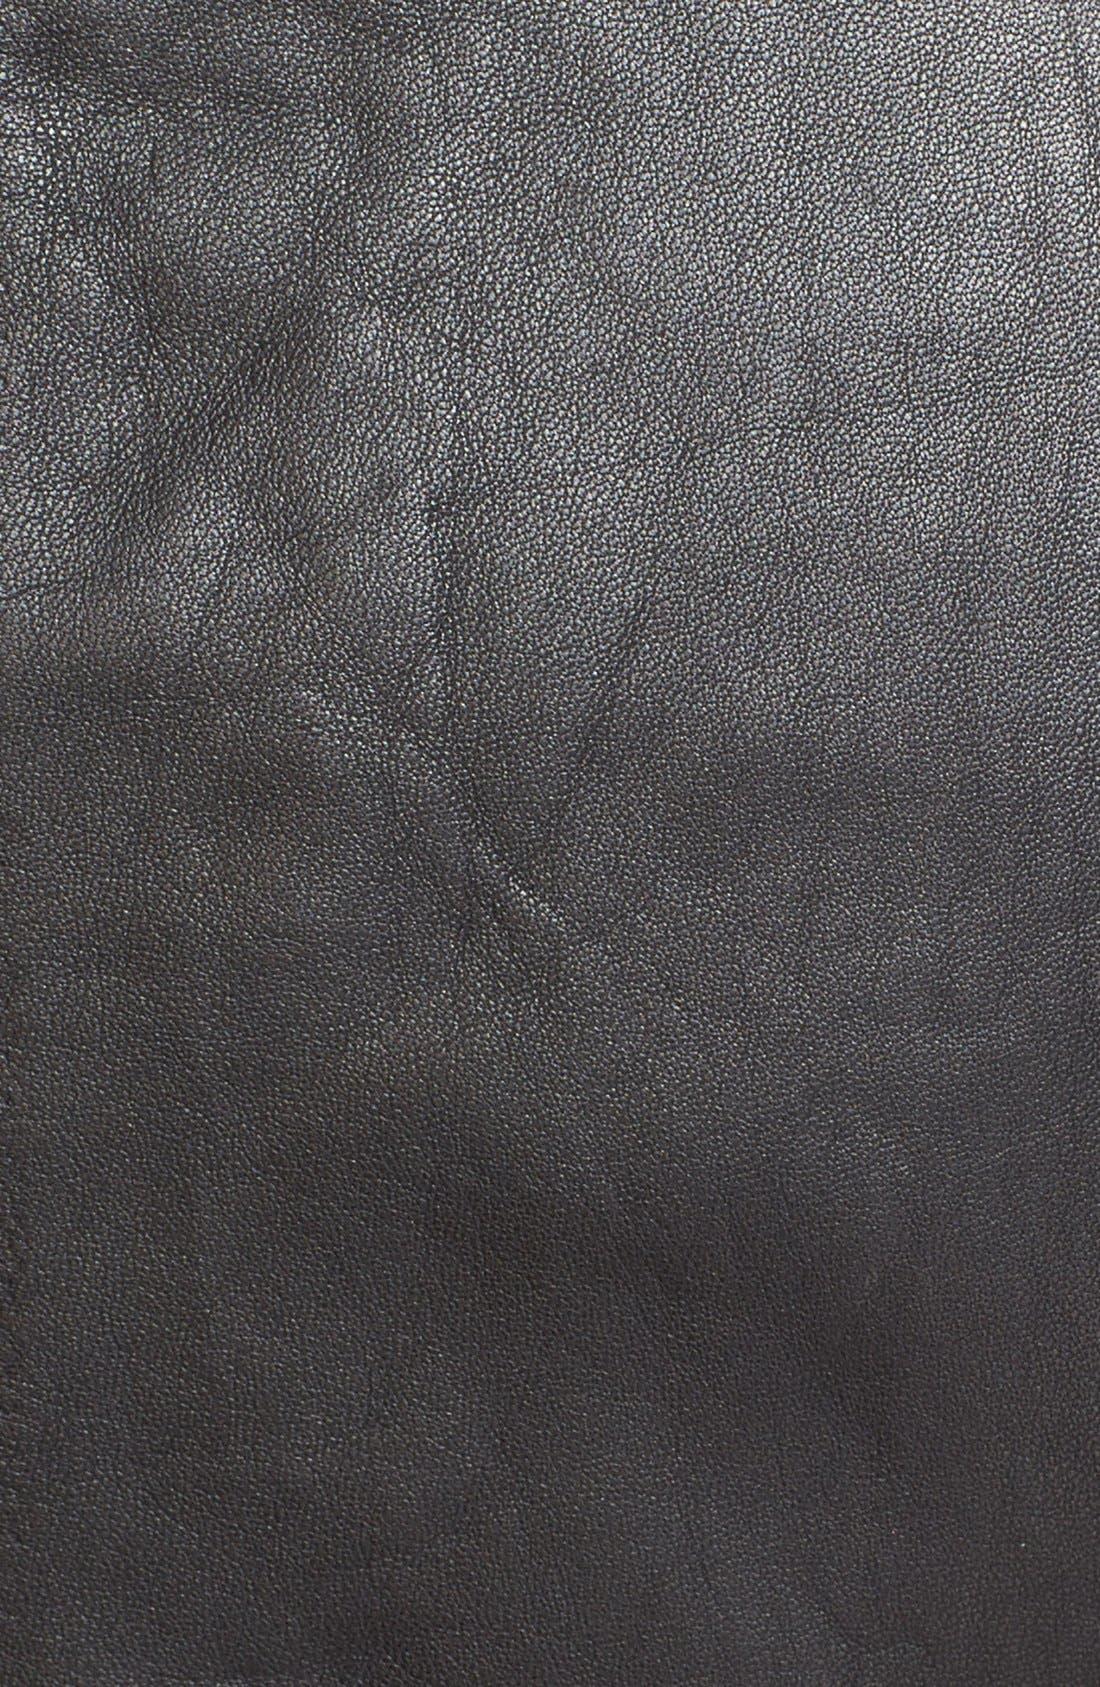 VEDA, 'Dali' Leather Jacket, Alternate thumbnail 6, color, 001